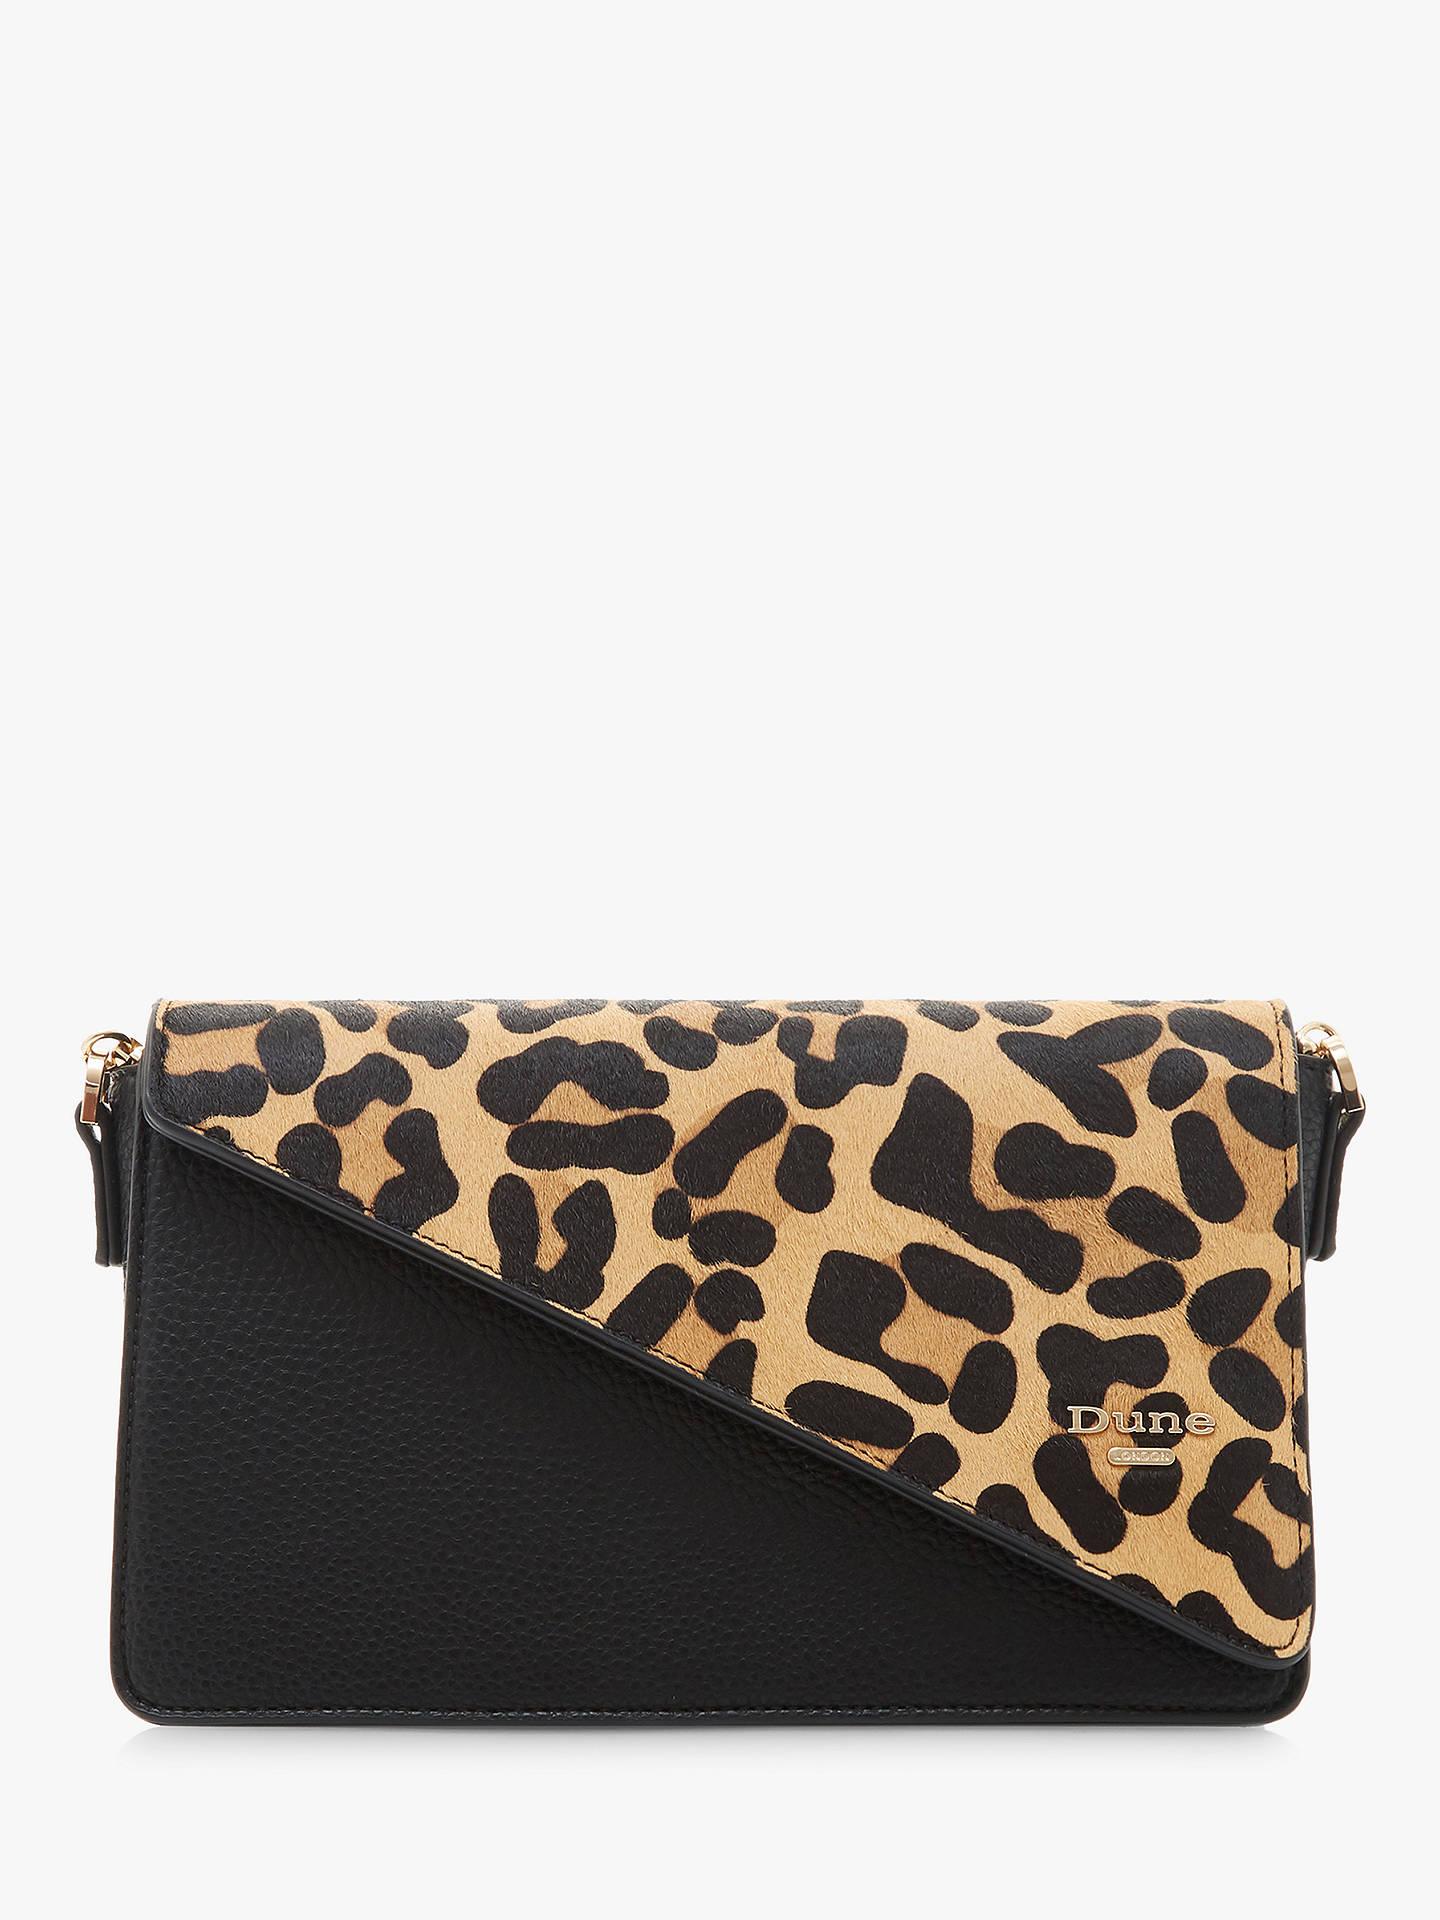 485611e3c5399 Buy Dune Erina Leather Clutch Bag